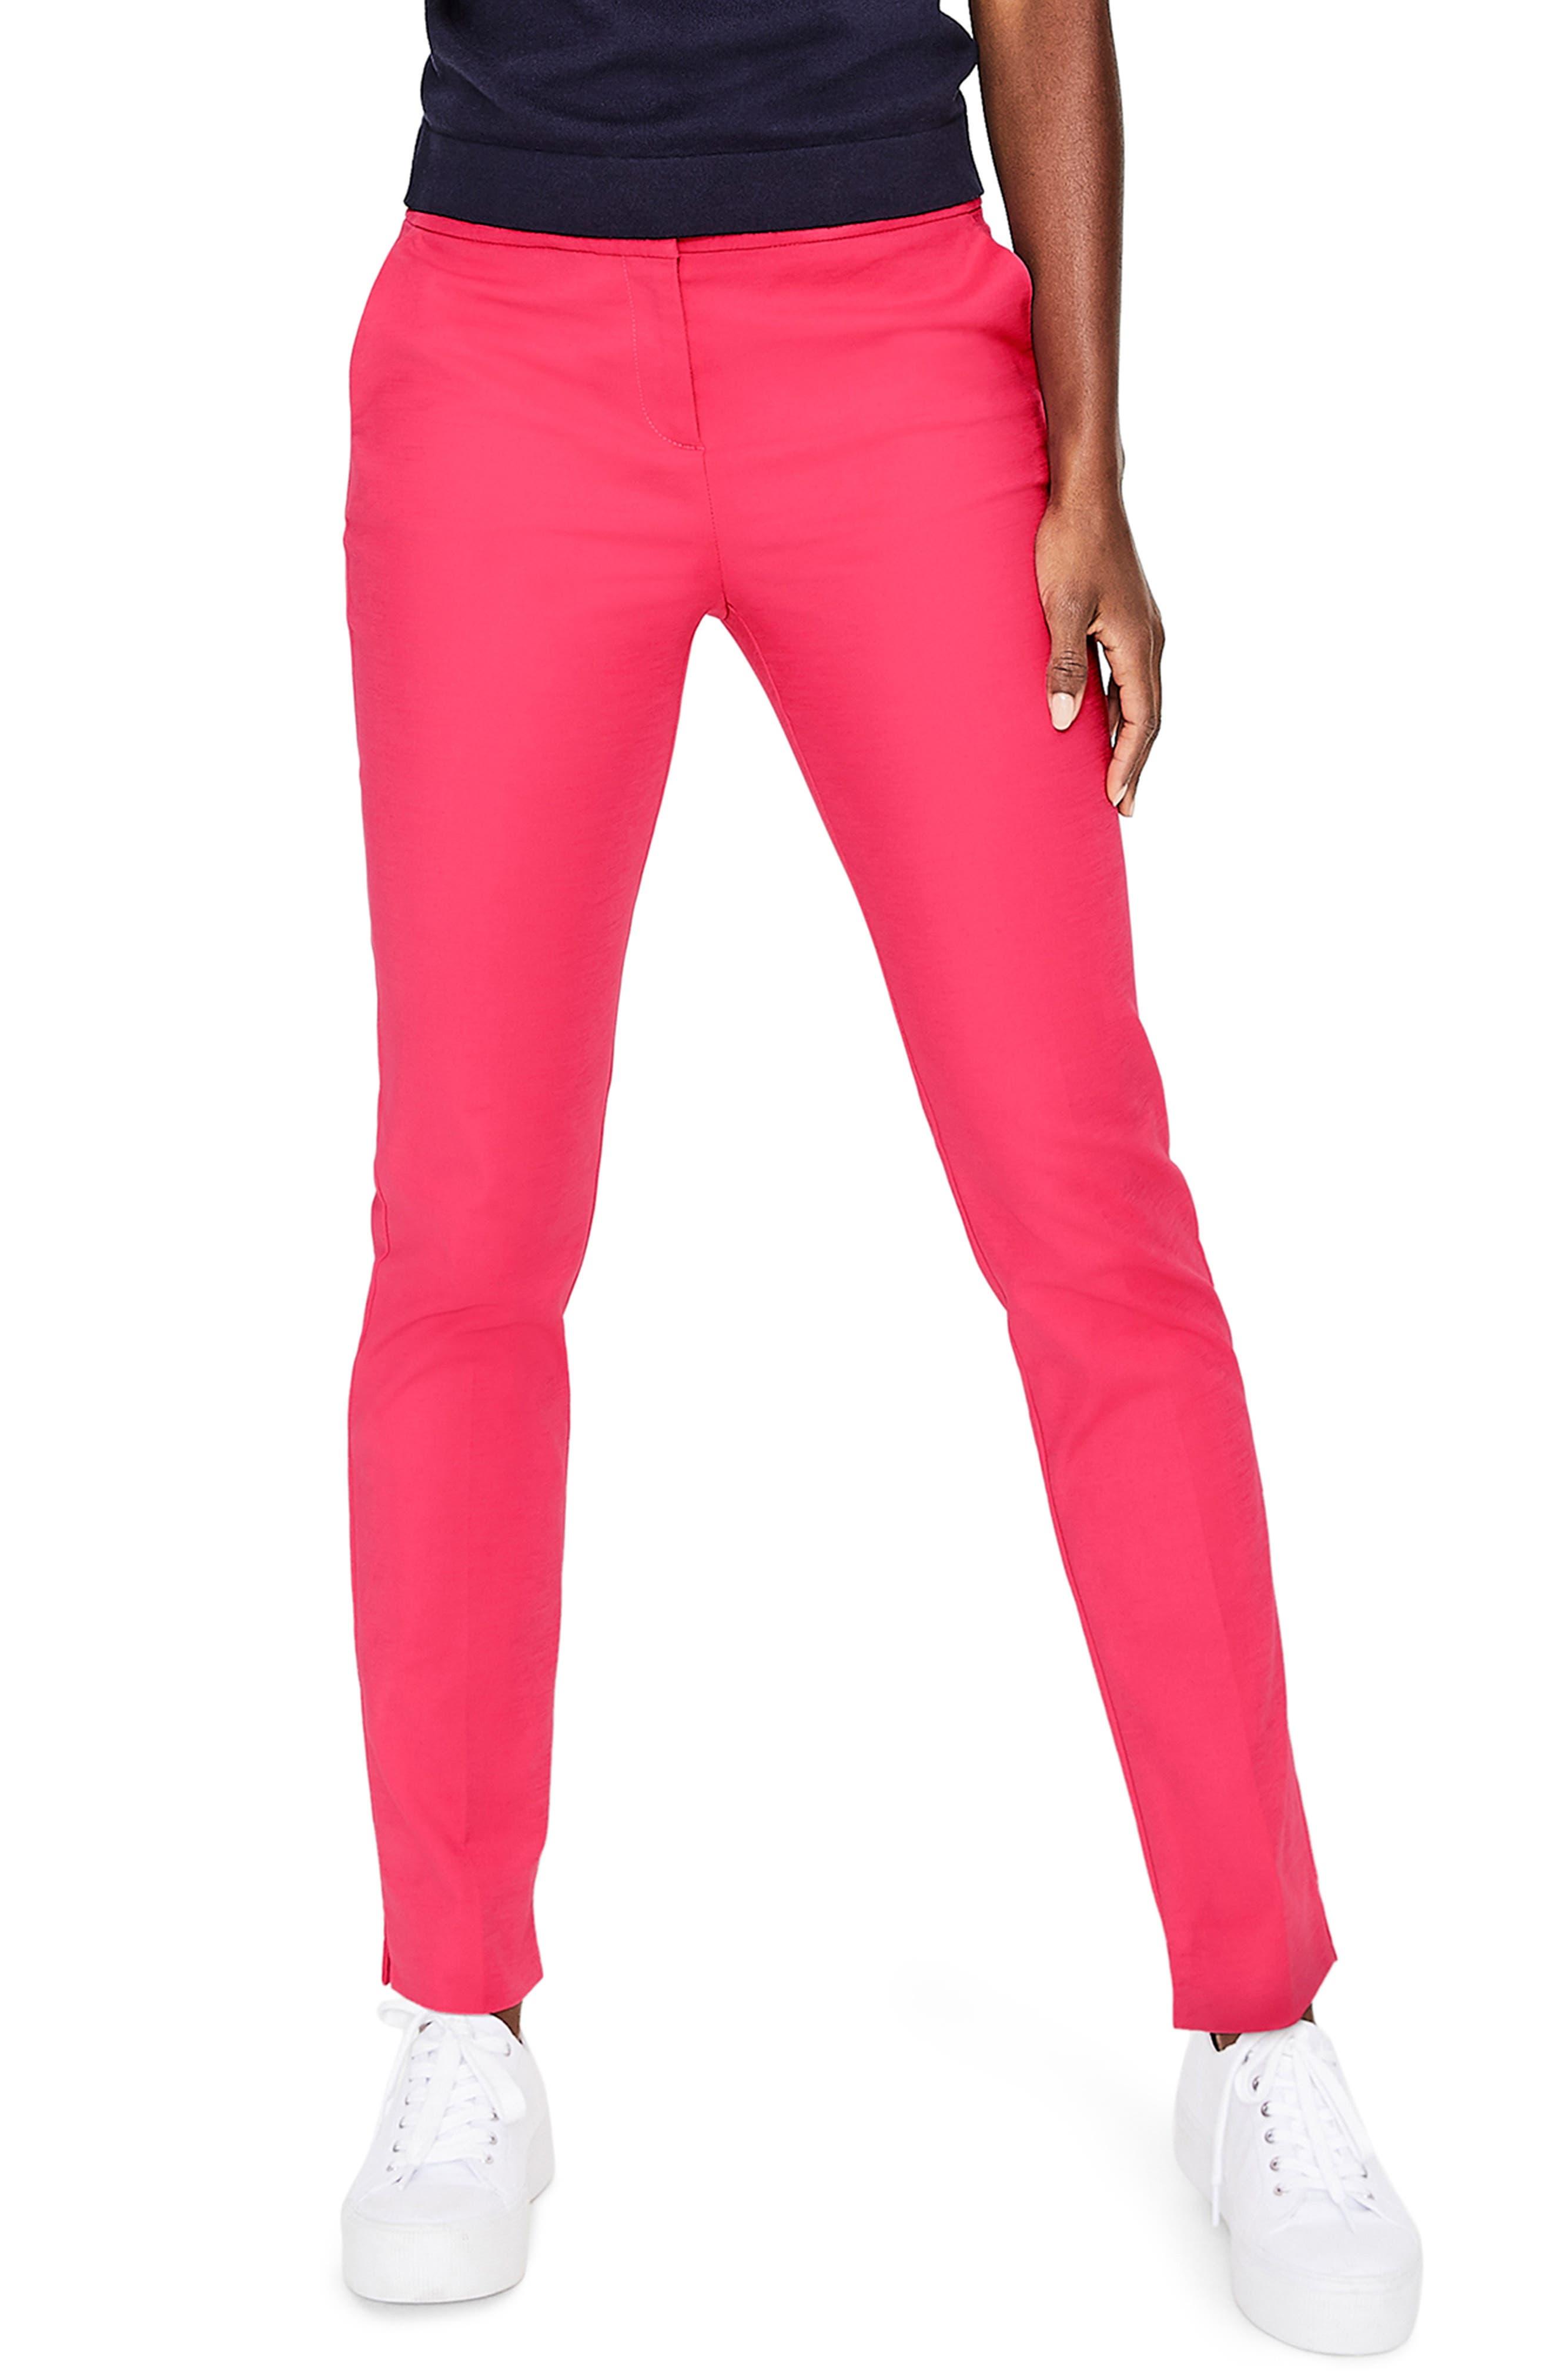 BODEN Richmond Stretch Cotton Trousers, Main, color, GARDEN ROSE